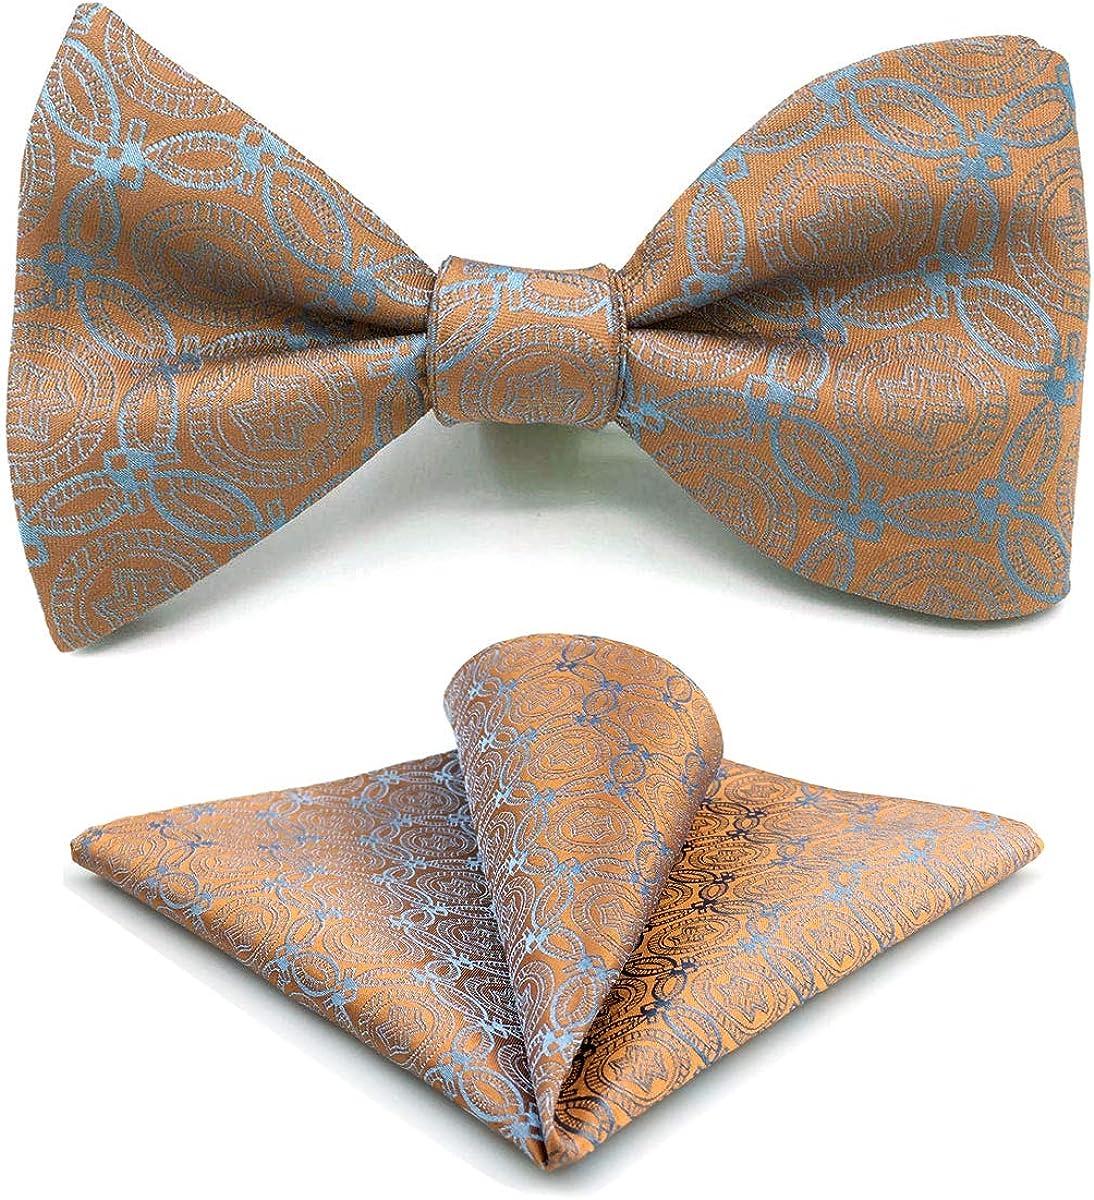 SHLAX&WING Silk Neckties for Men Orange Blue Geometric Patterned Tie Designer